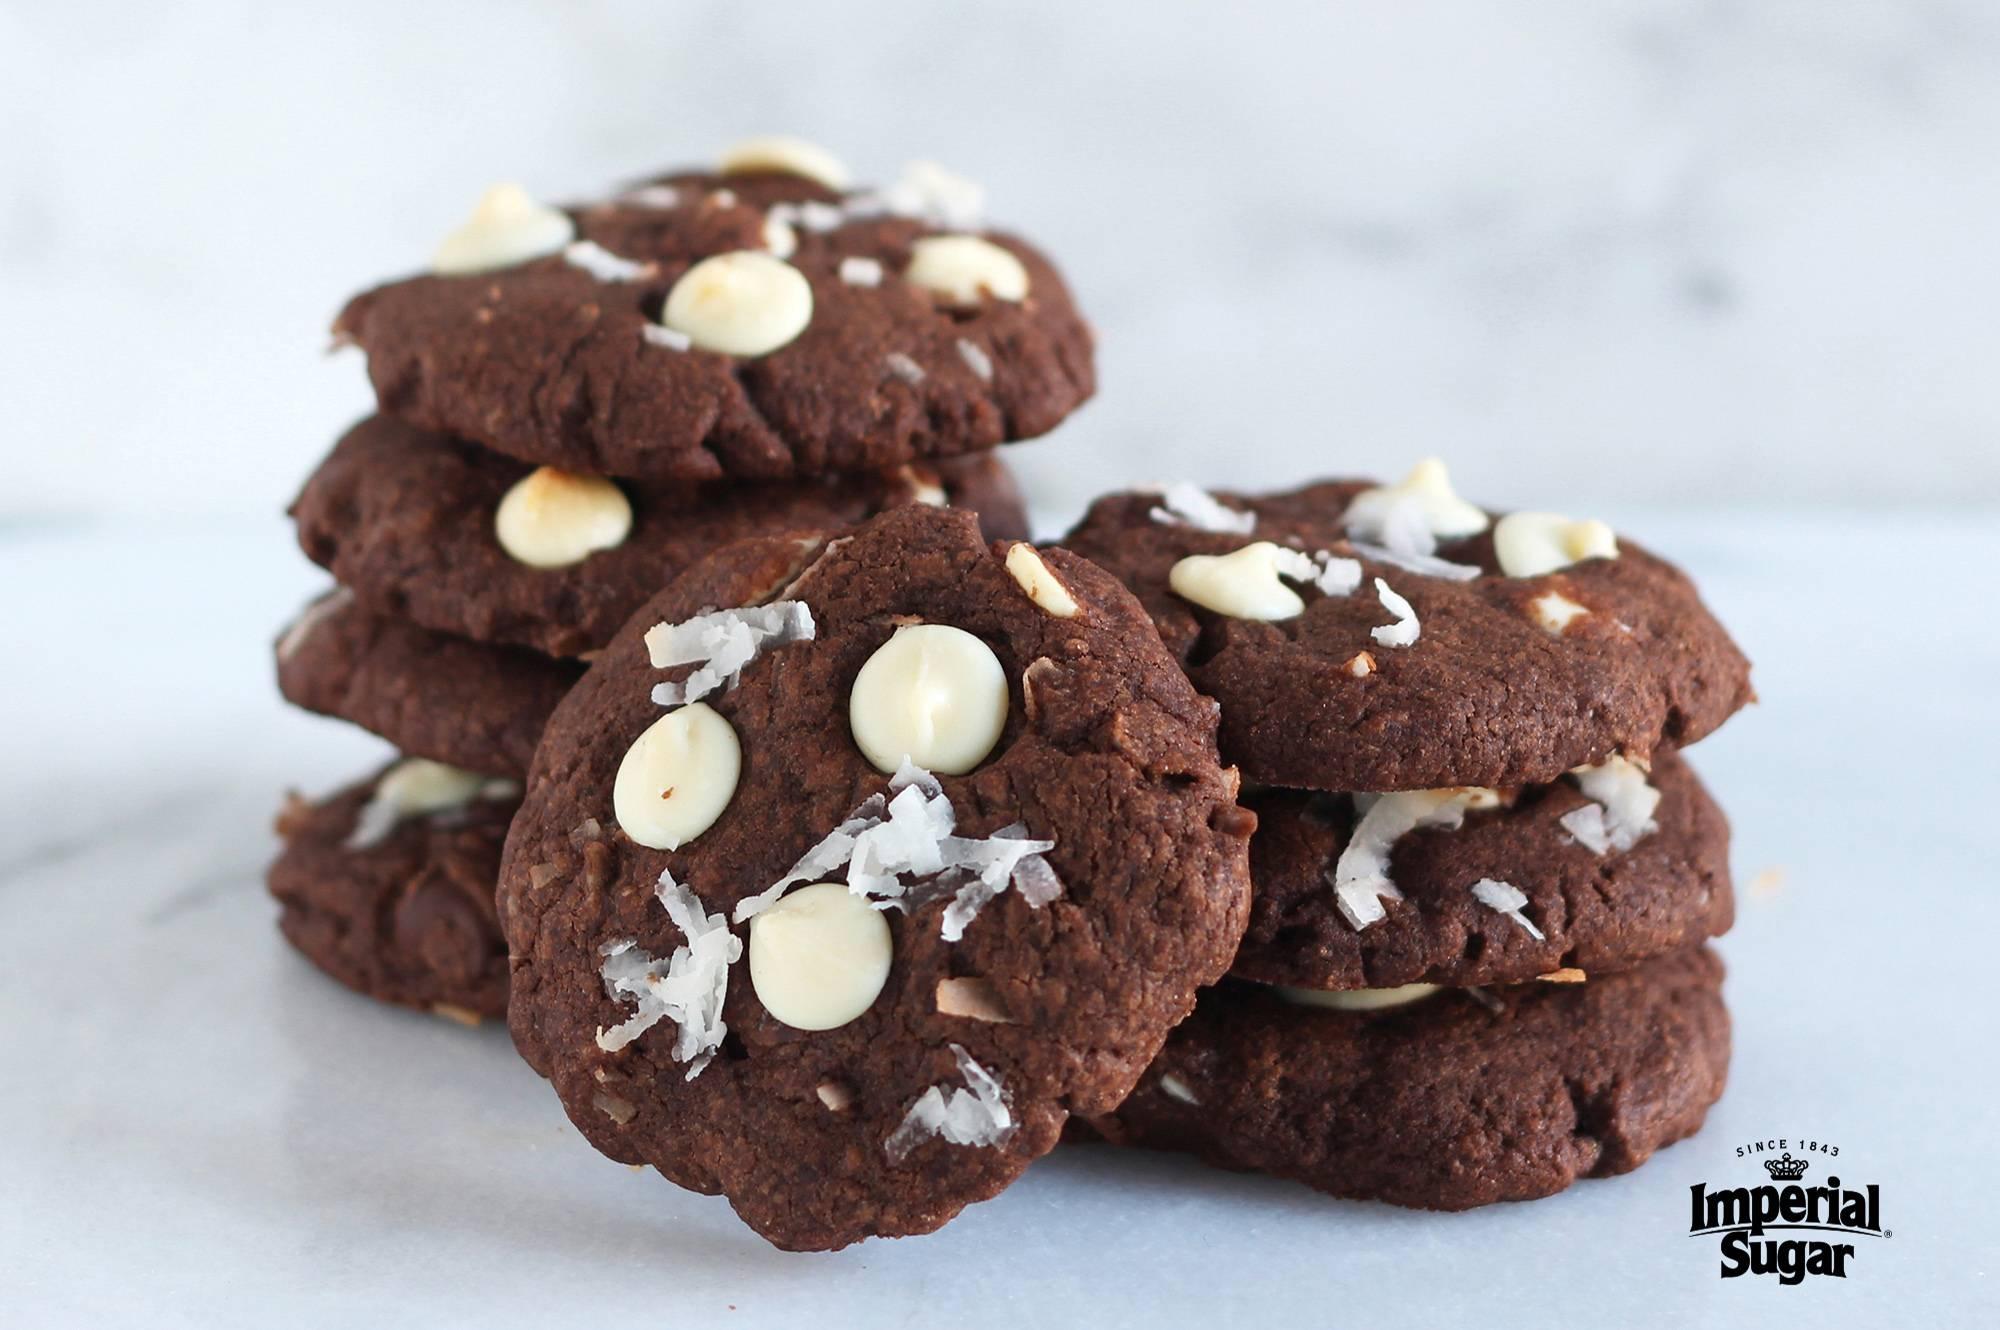 Perky Chocolate Coconut Cookies Imperial Sugar Chocolate Coconut Cookies Uk Chocolate Coconut Cookies Almonds nice food Chocolate Coconut Cookies